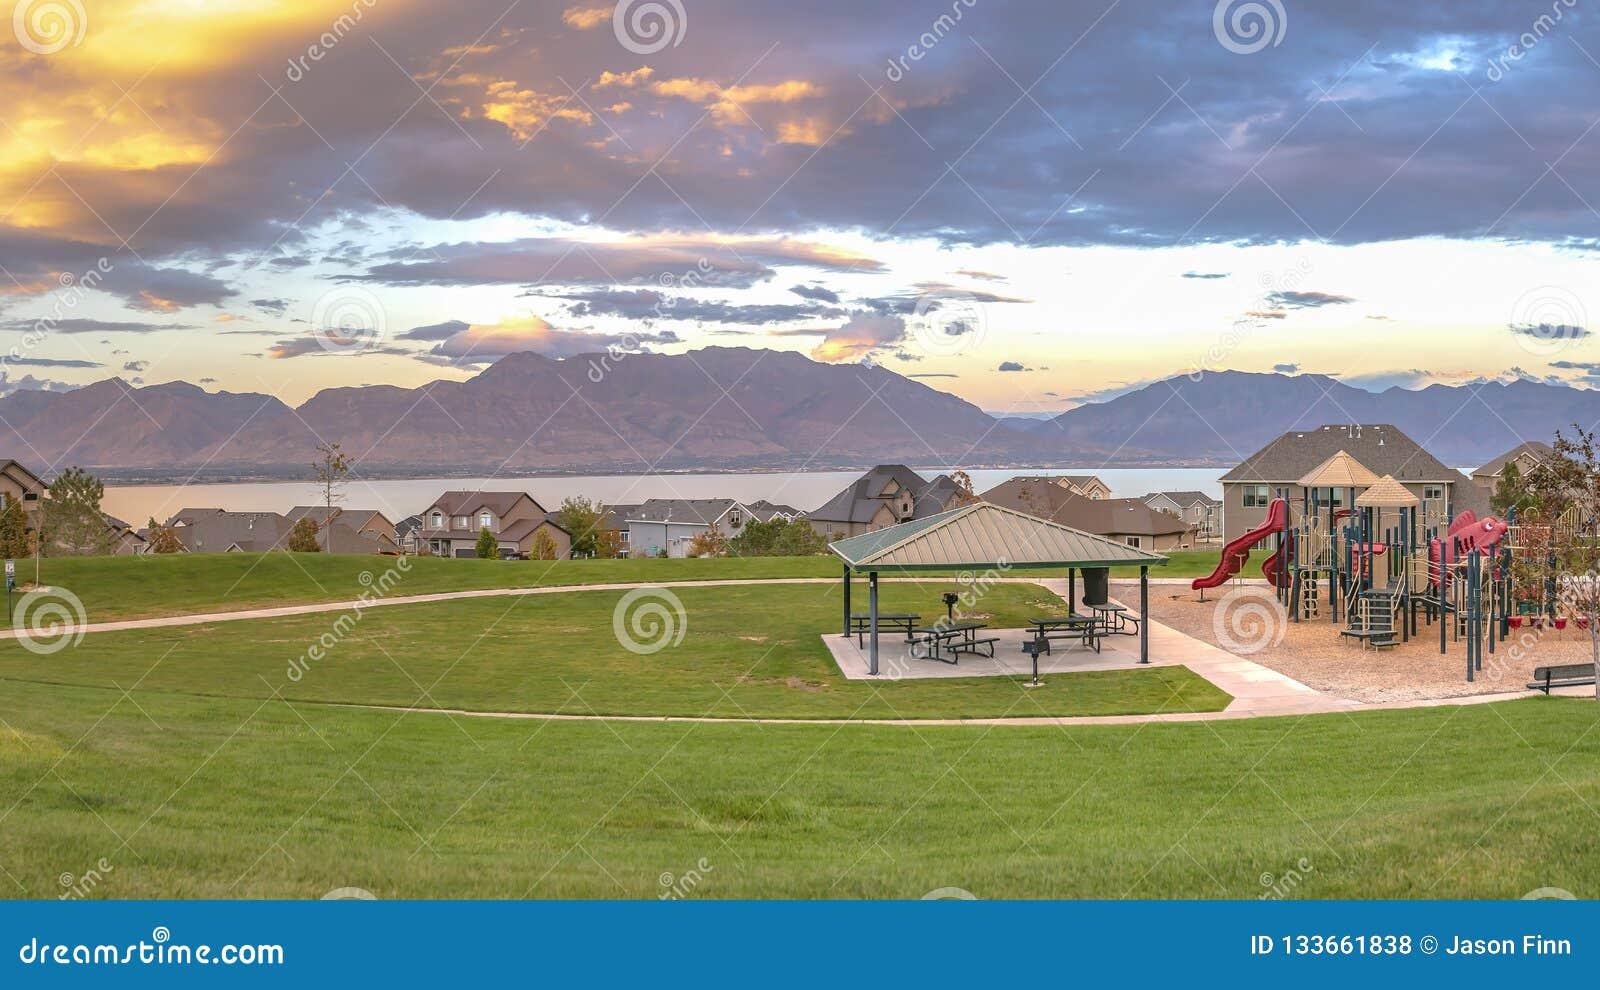 Casas e campo de jogos com lago e Mountain View